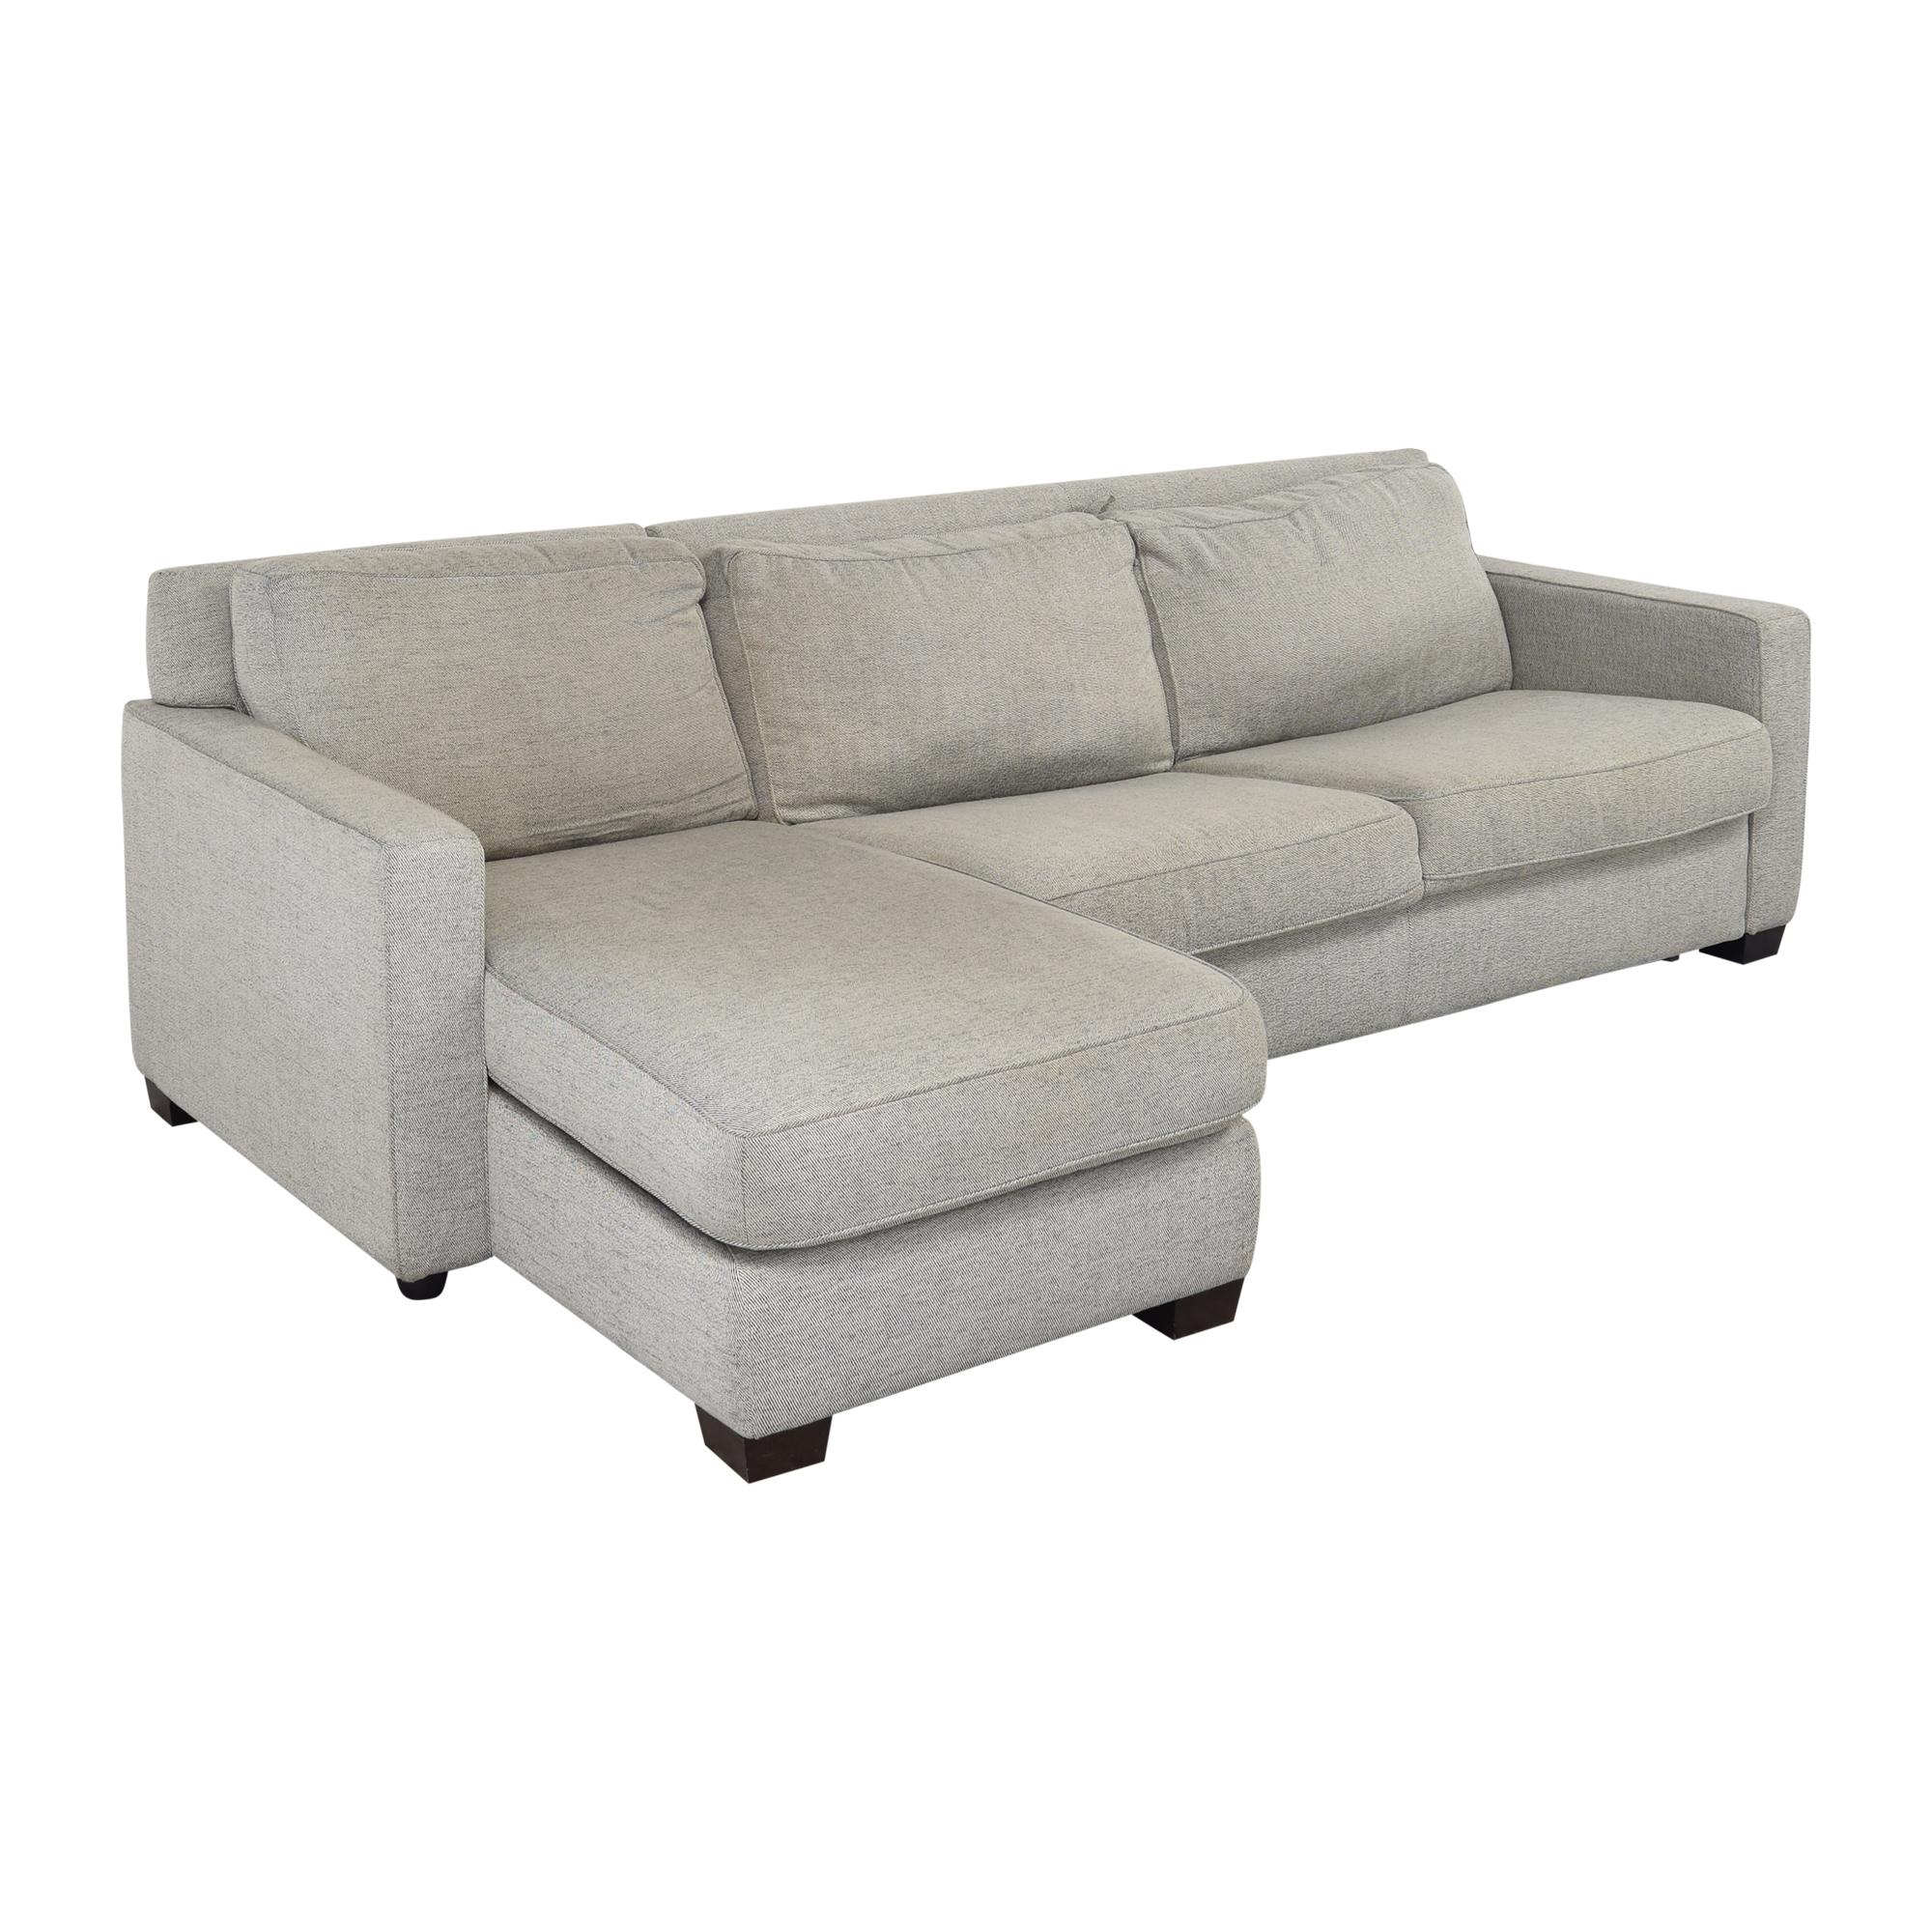 buy West Elm West Elm Henry 2 Piece Full Sleeper Storage Sofa online